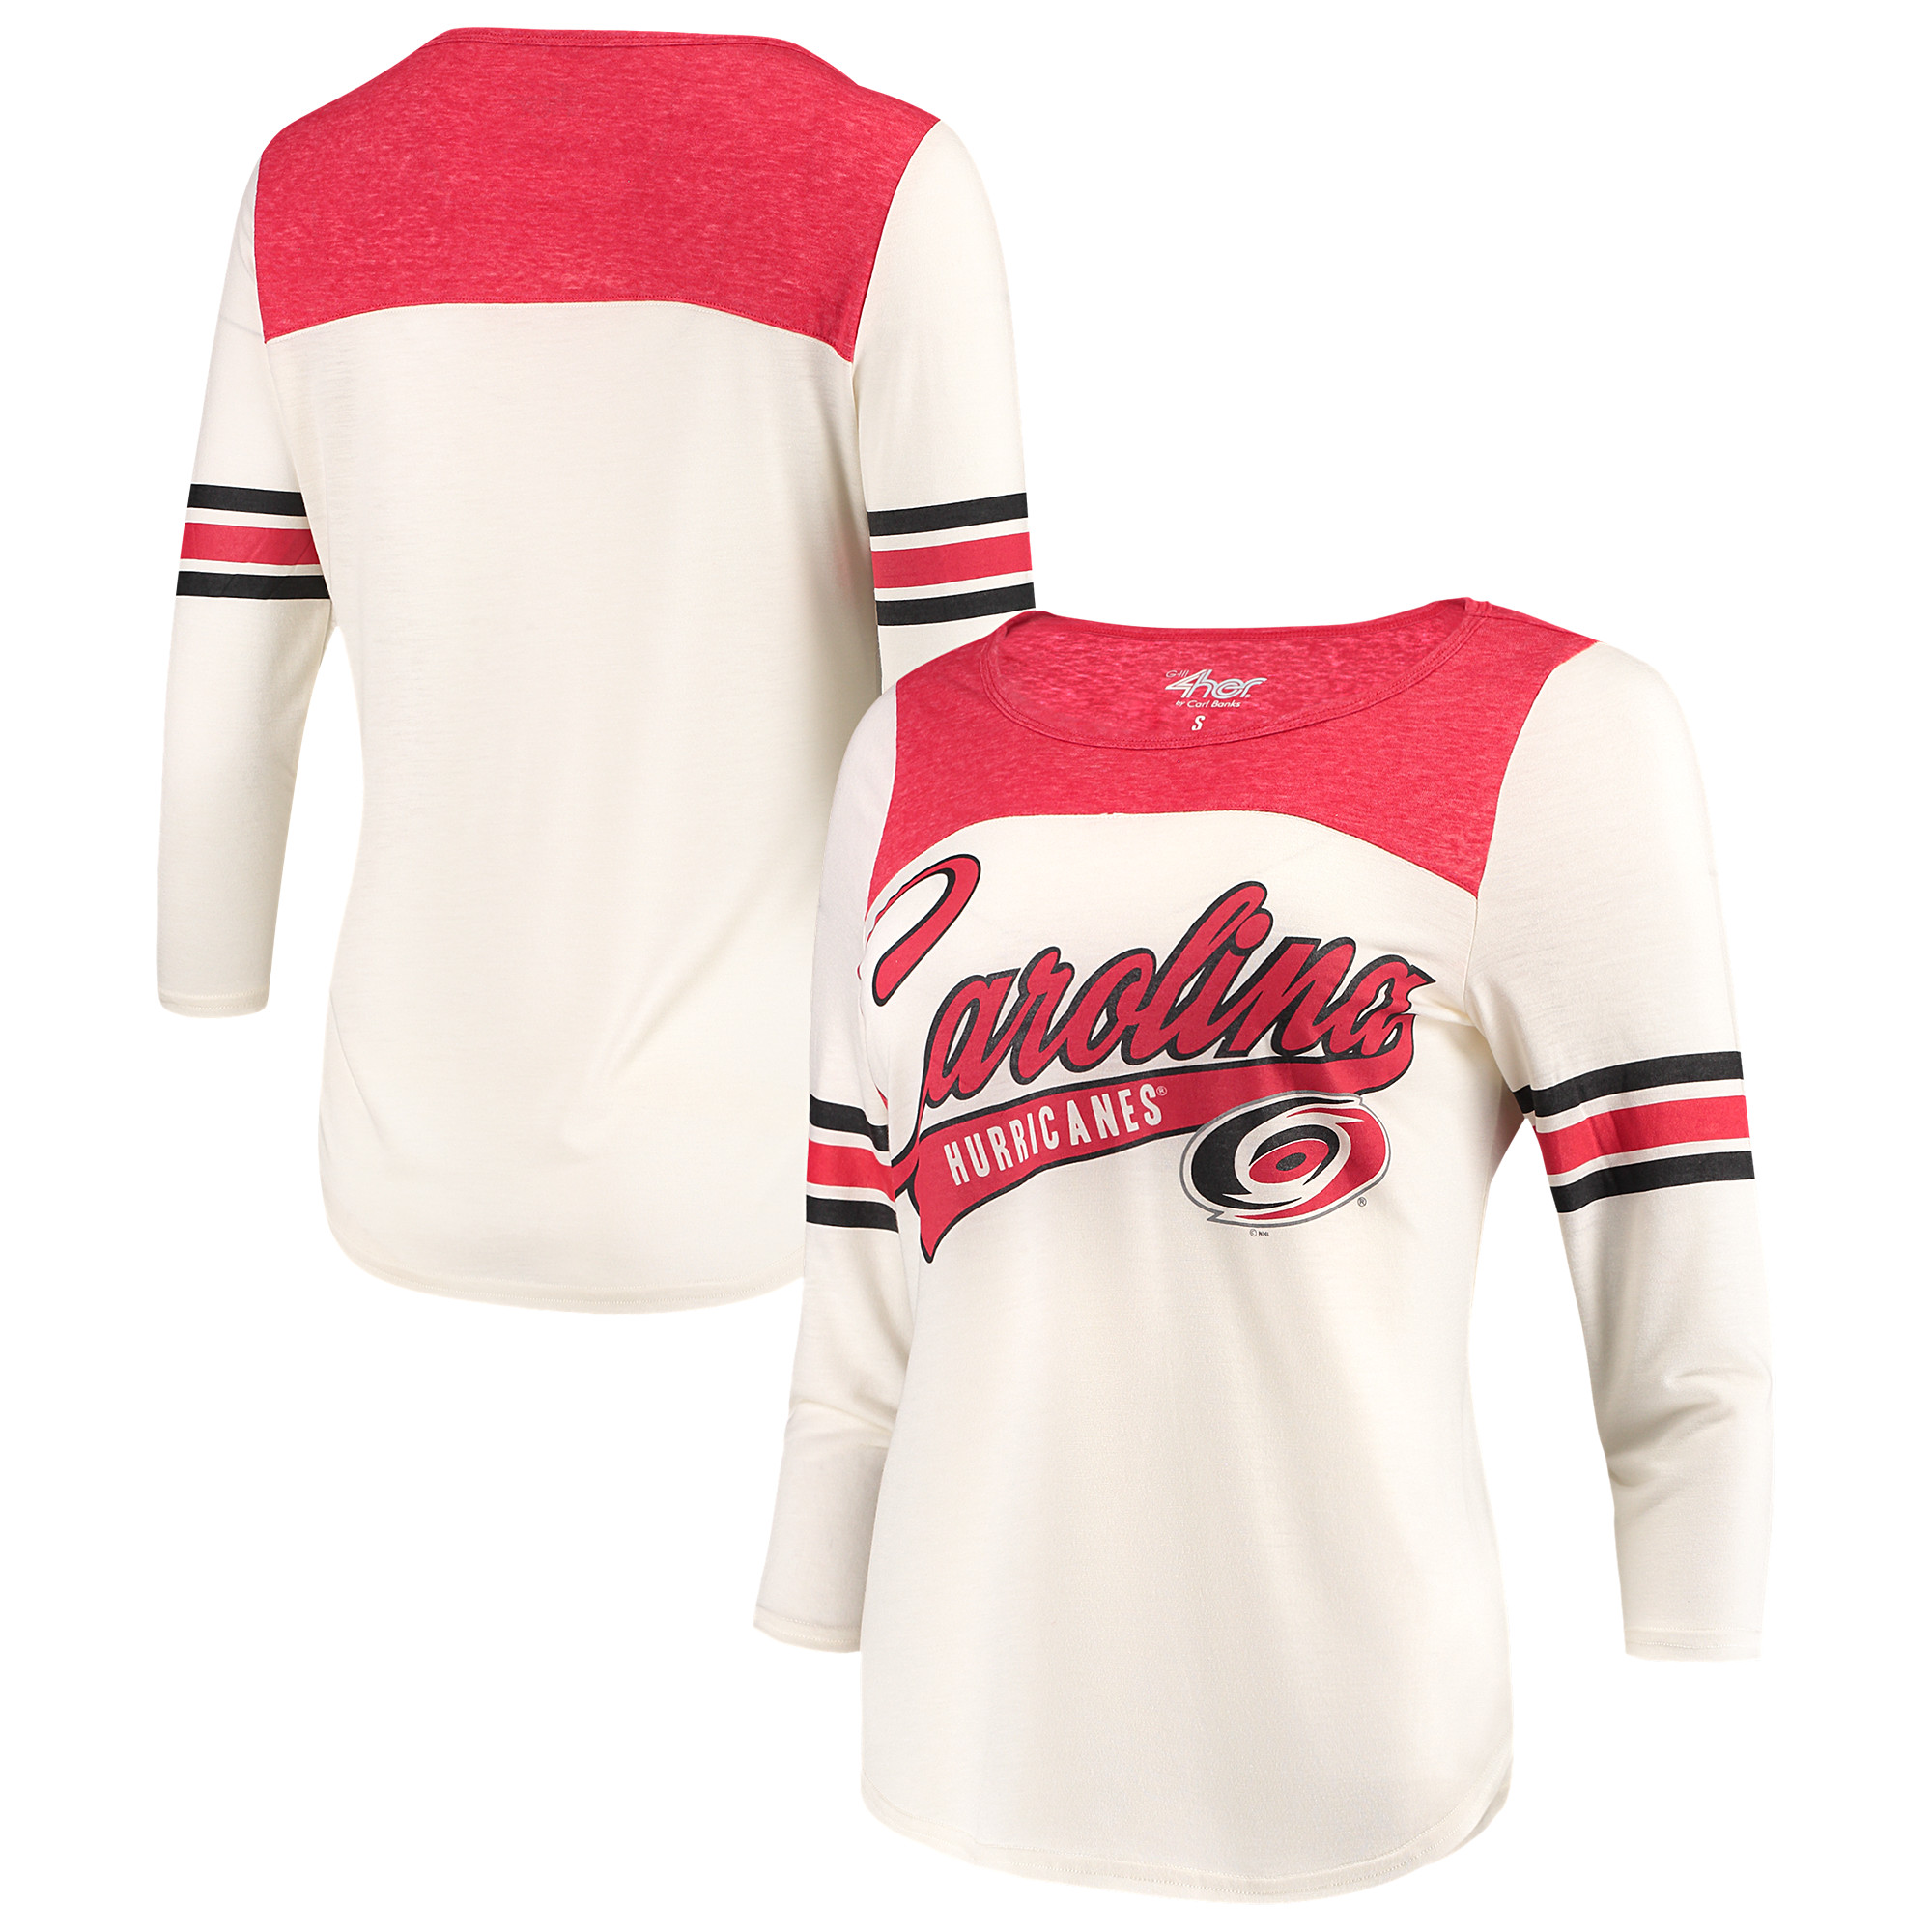 Carolina Hurricanes G-III 4Her by Carl Banks Women's Endzone 3/4-Length Sleeve T-Shirt - Cream/Red